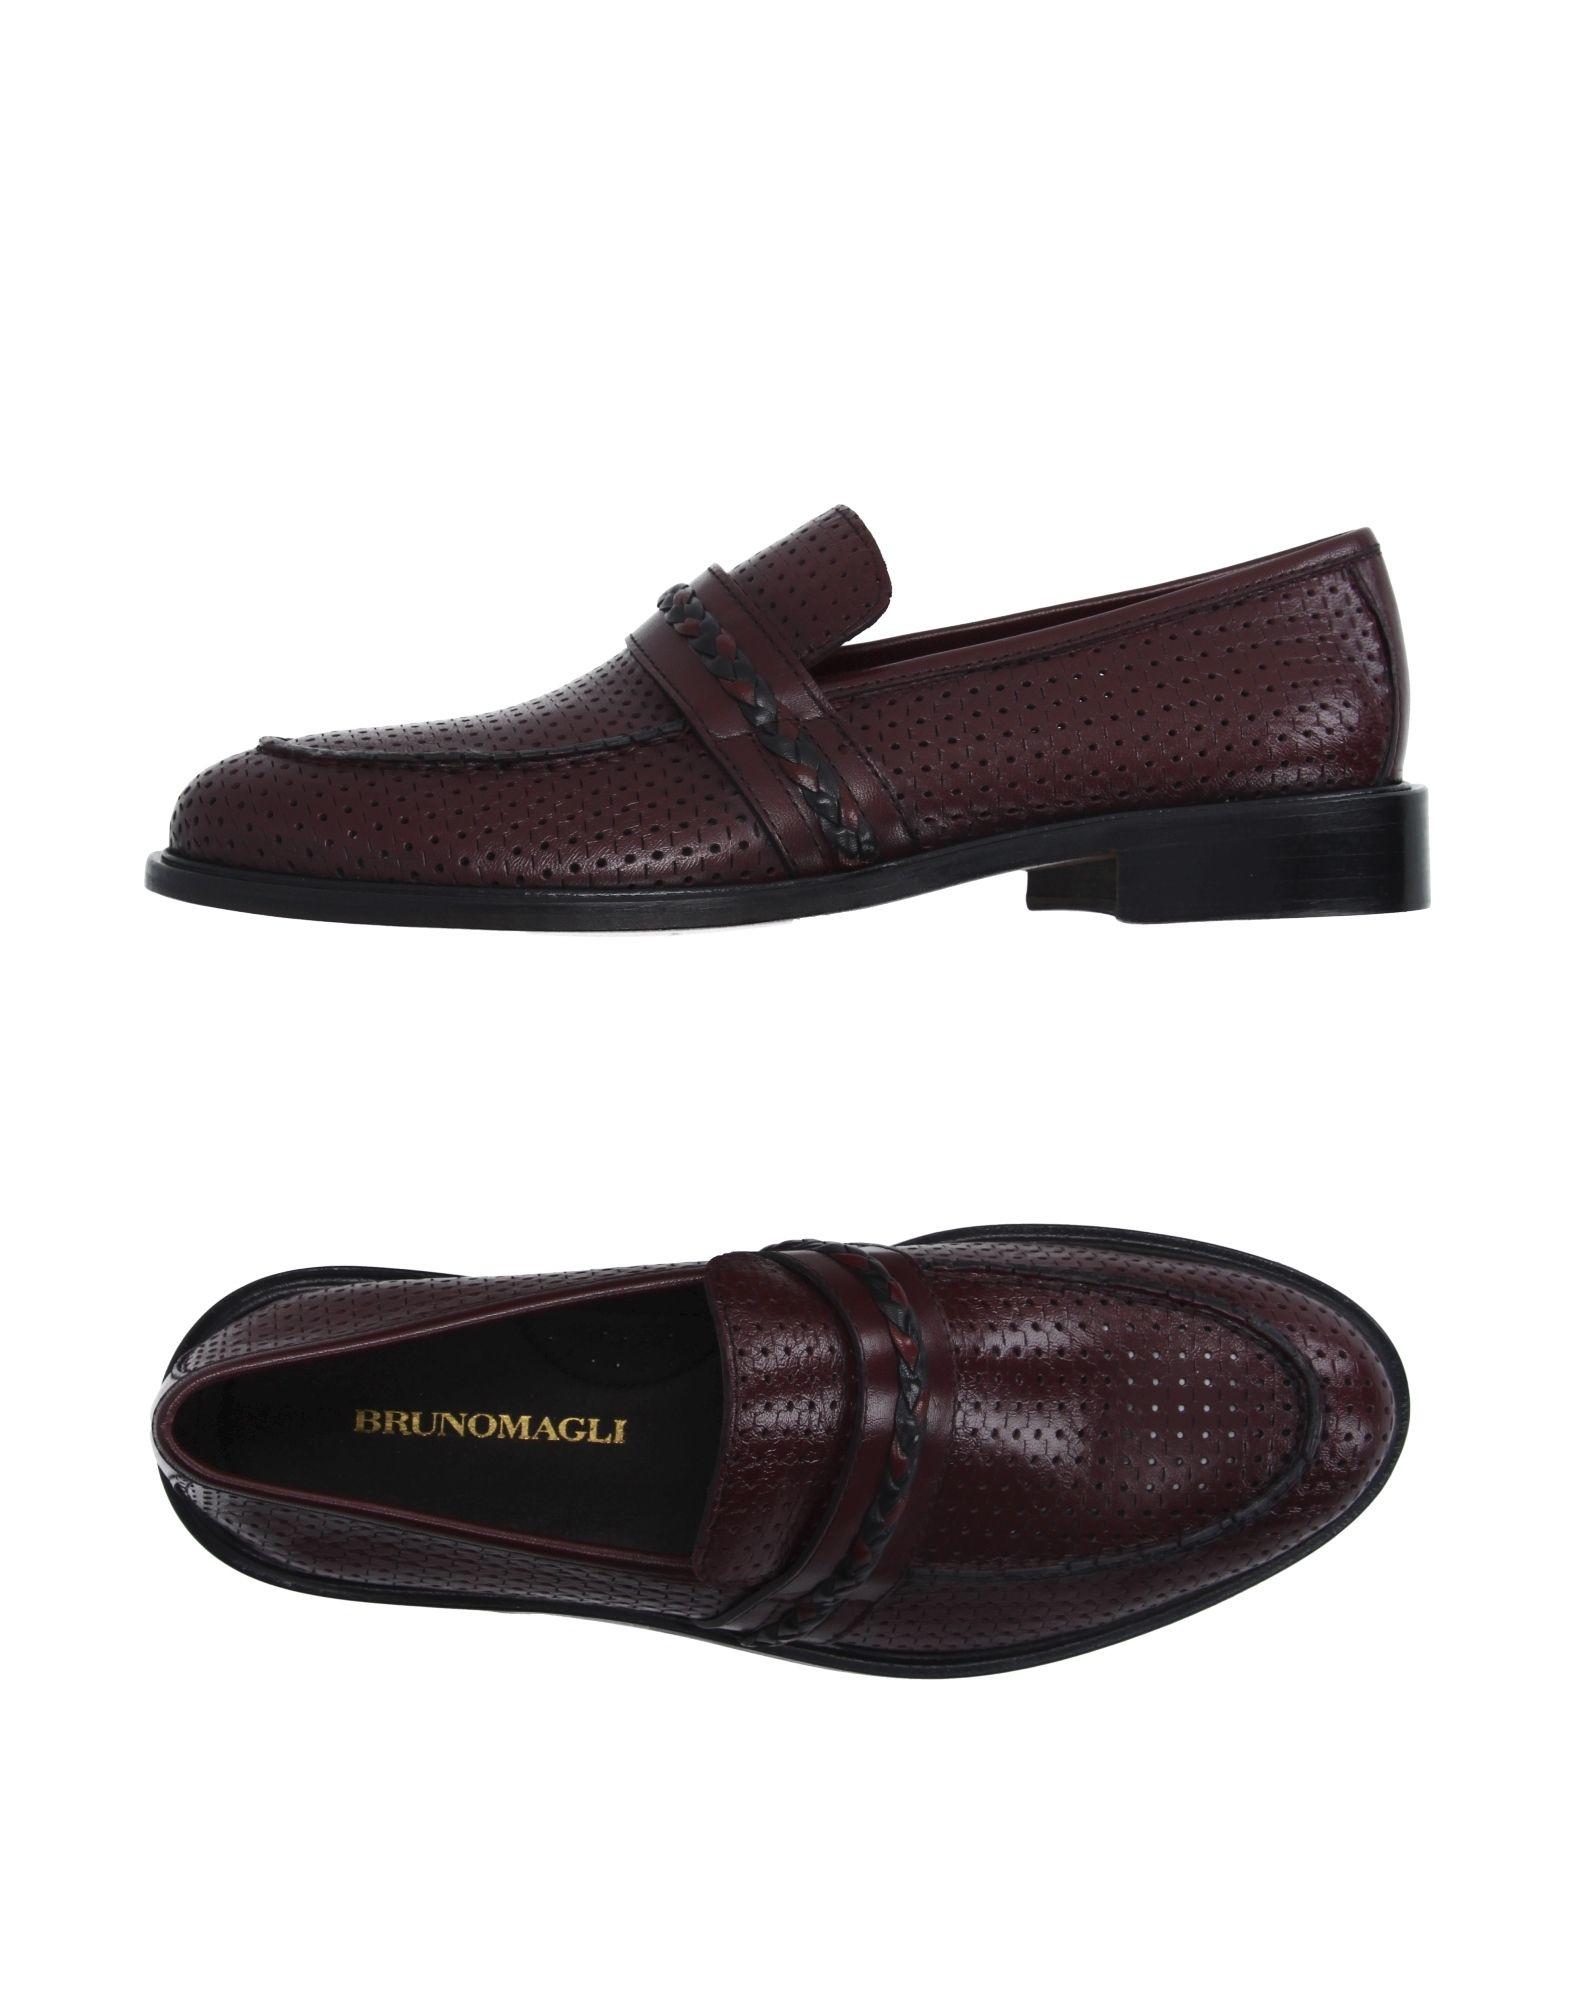 John Varvatos Redding Boat Shoes